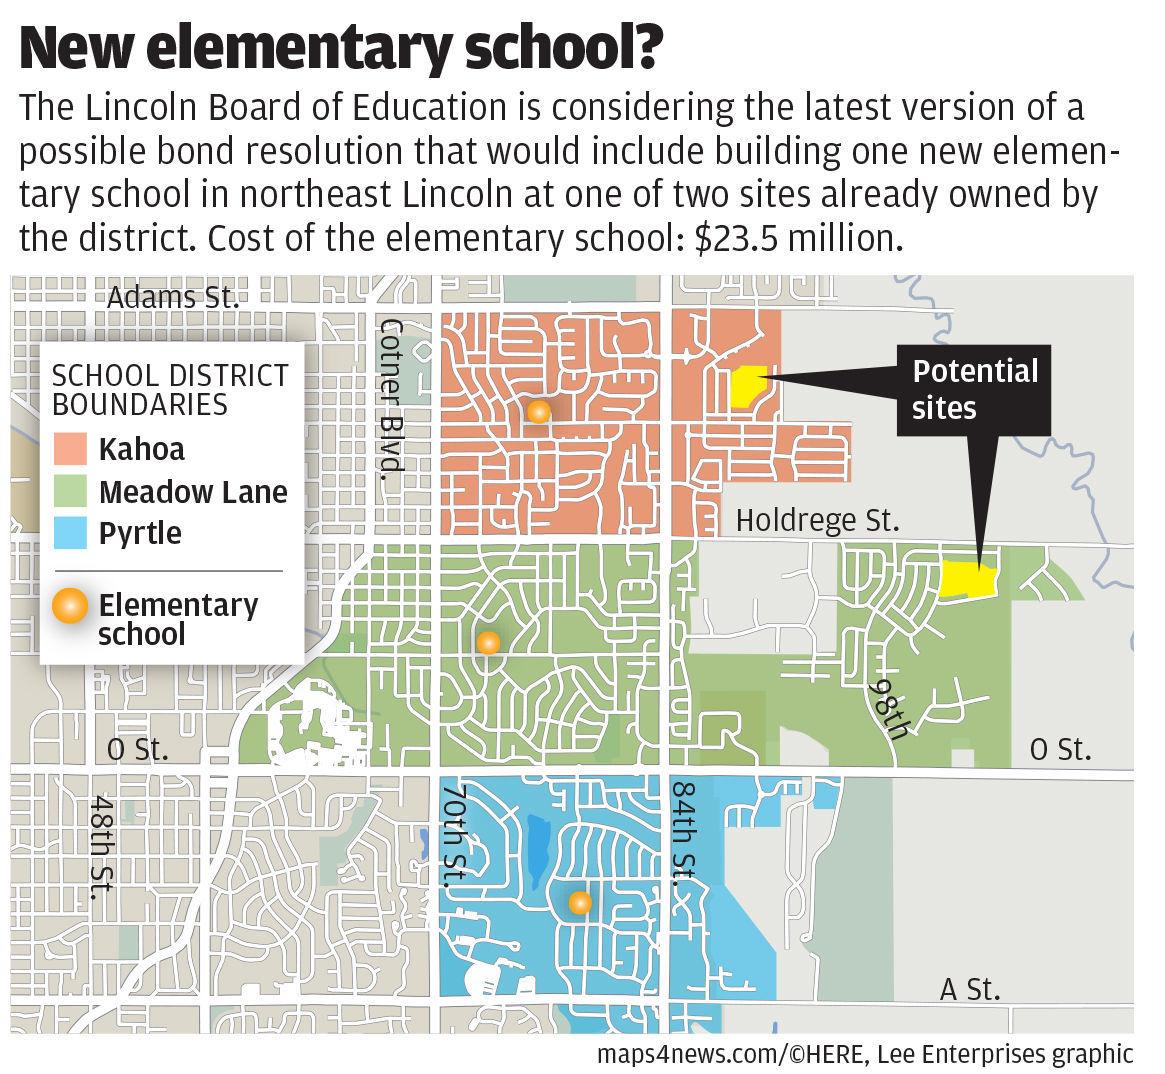 New elementary school?